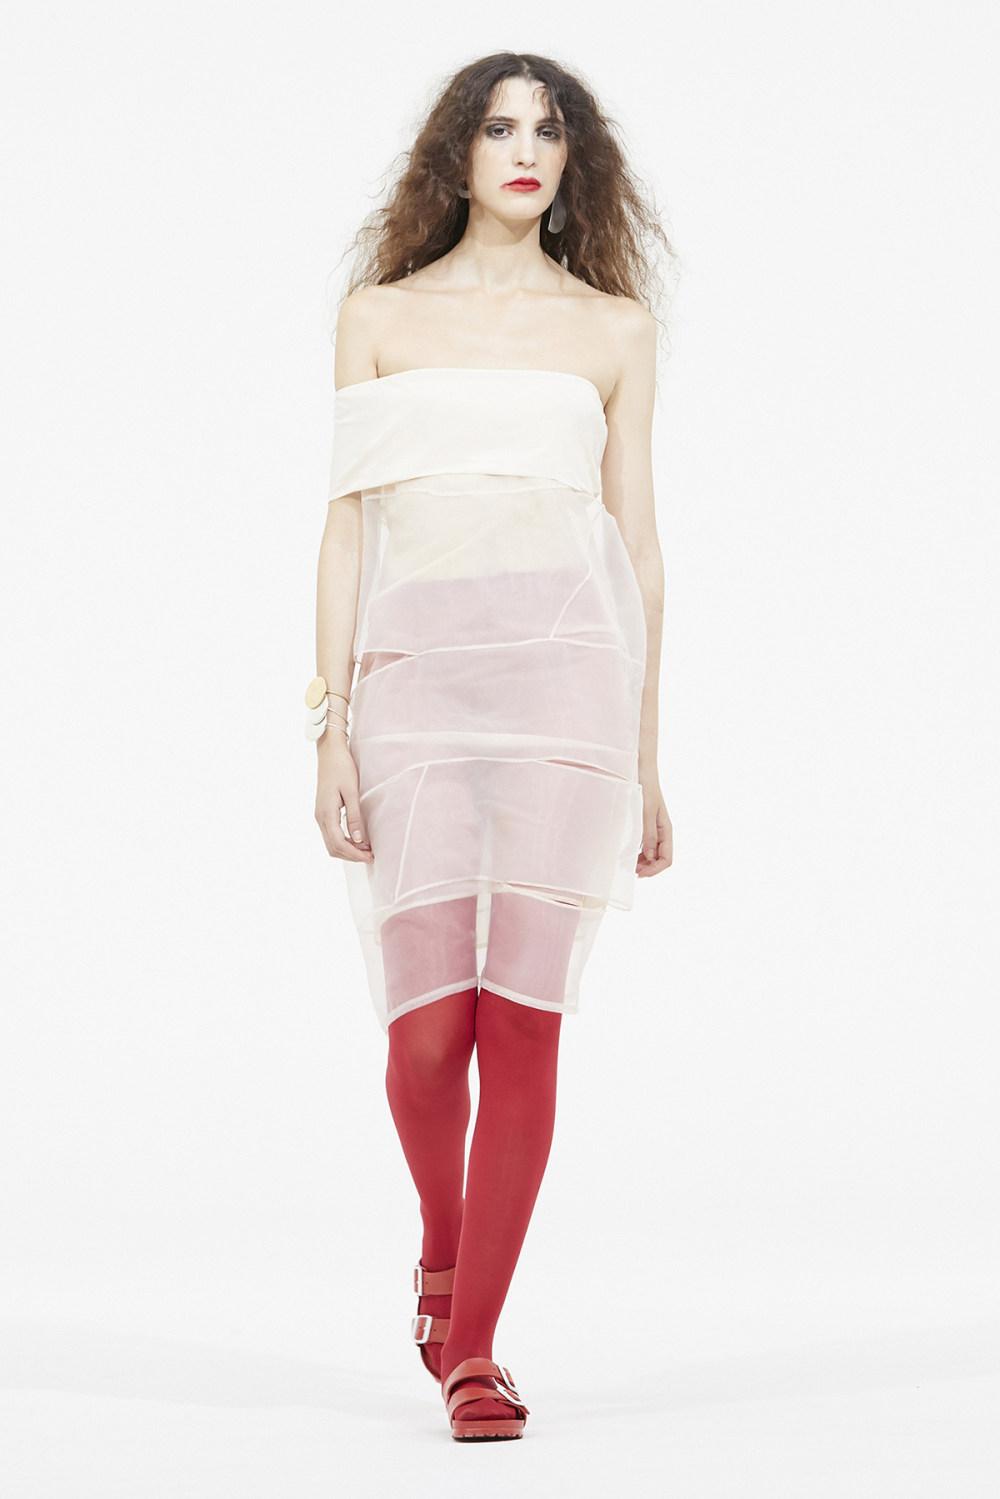 Nicolas Andreas Taralis时装系列技术织物矩形条纹被缝合在一起-8.jpg